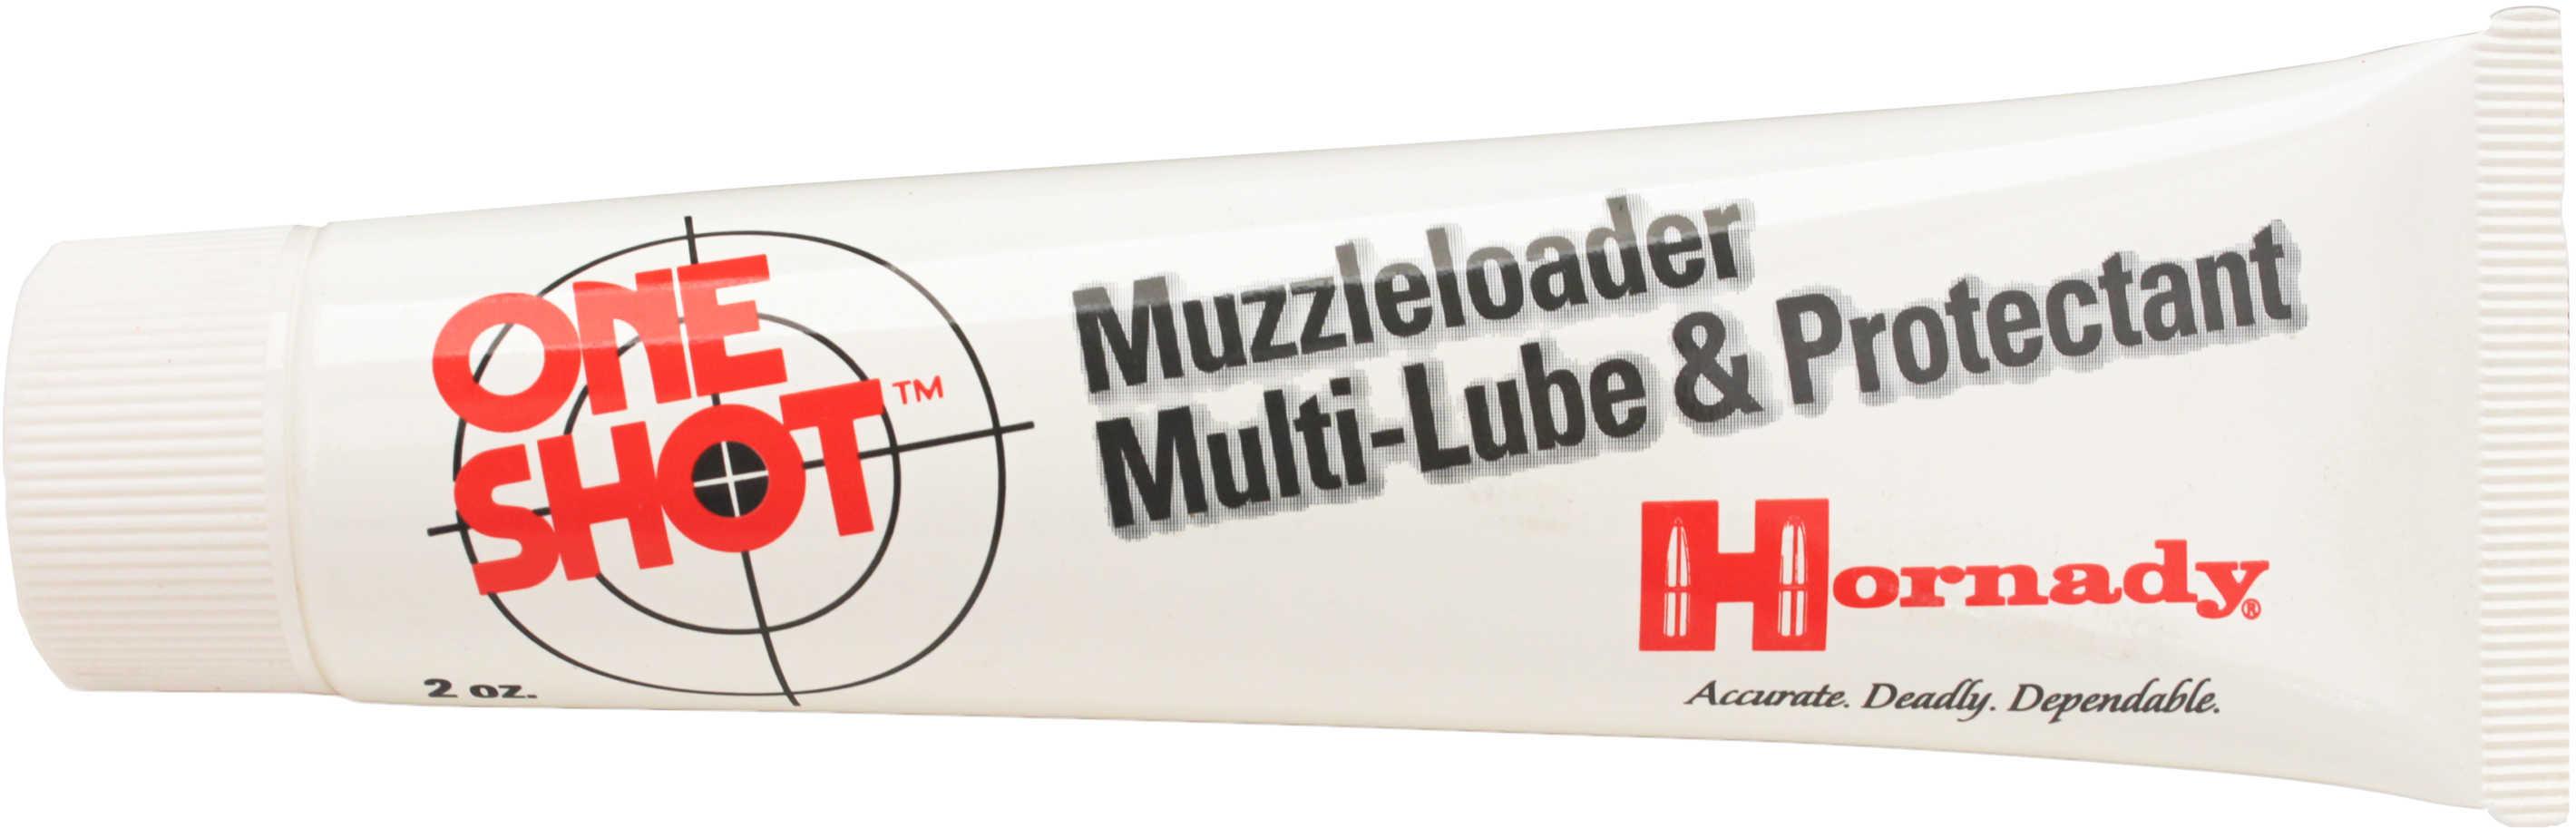 Hornady Muzzleloader Multilube Md: 6691